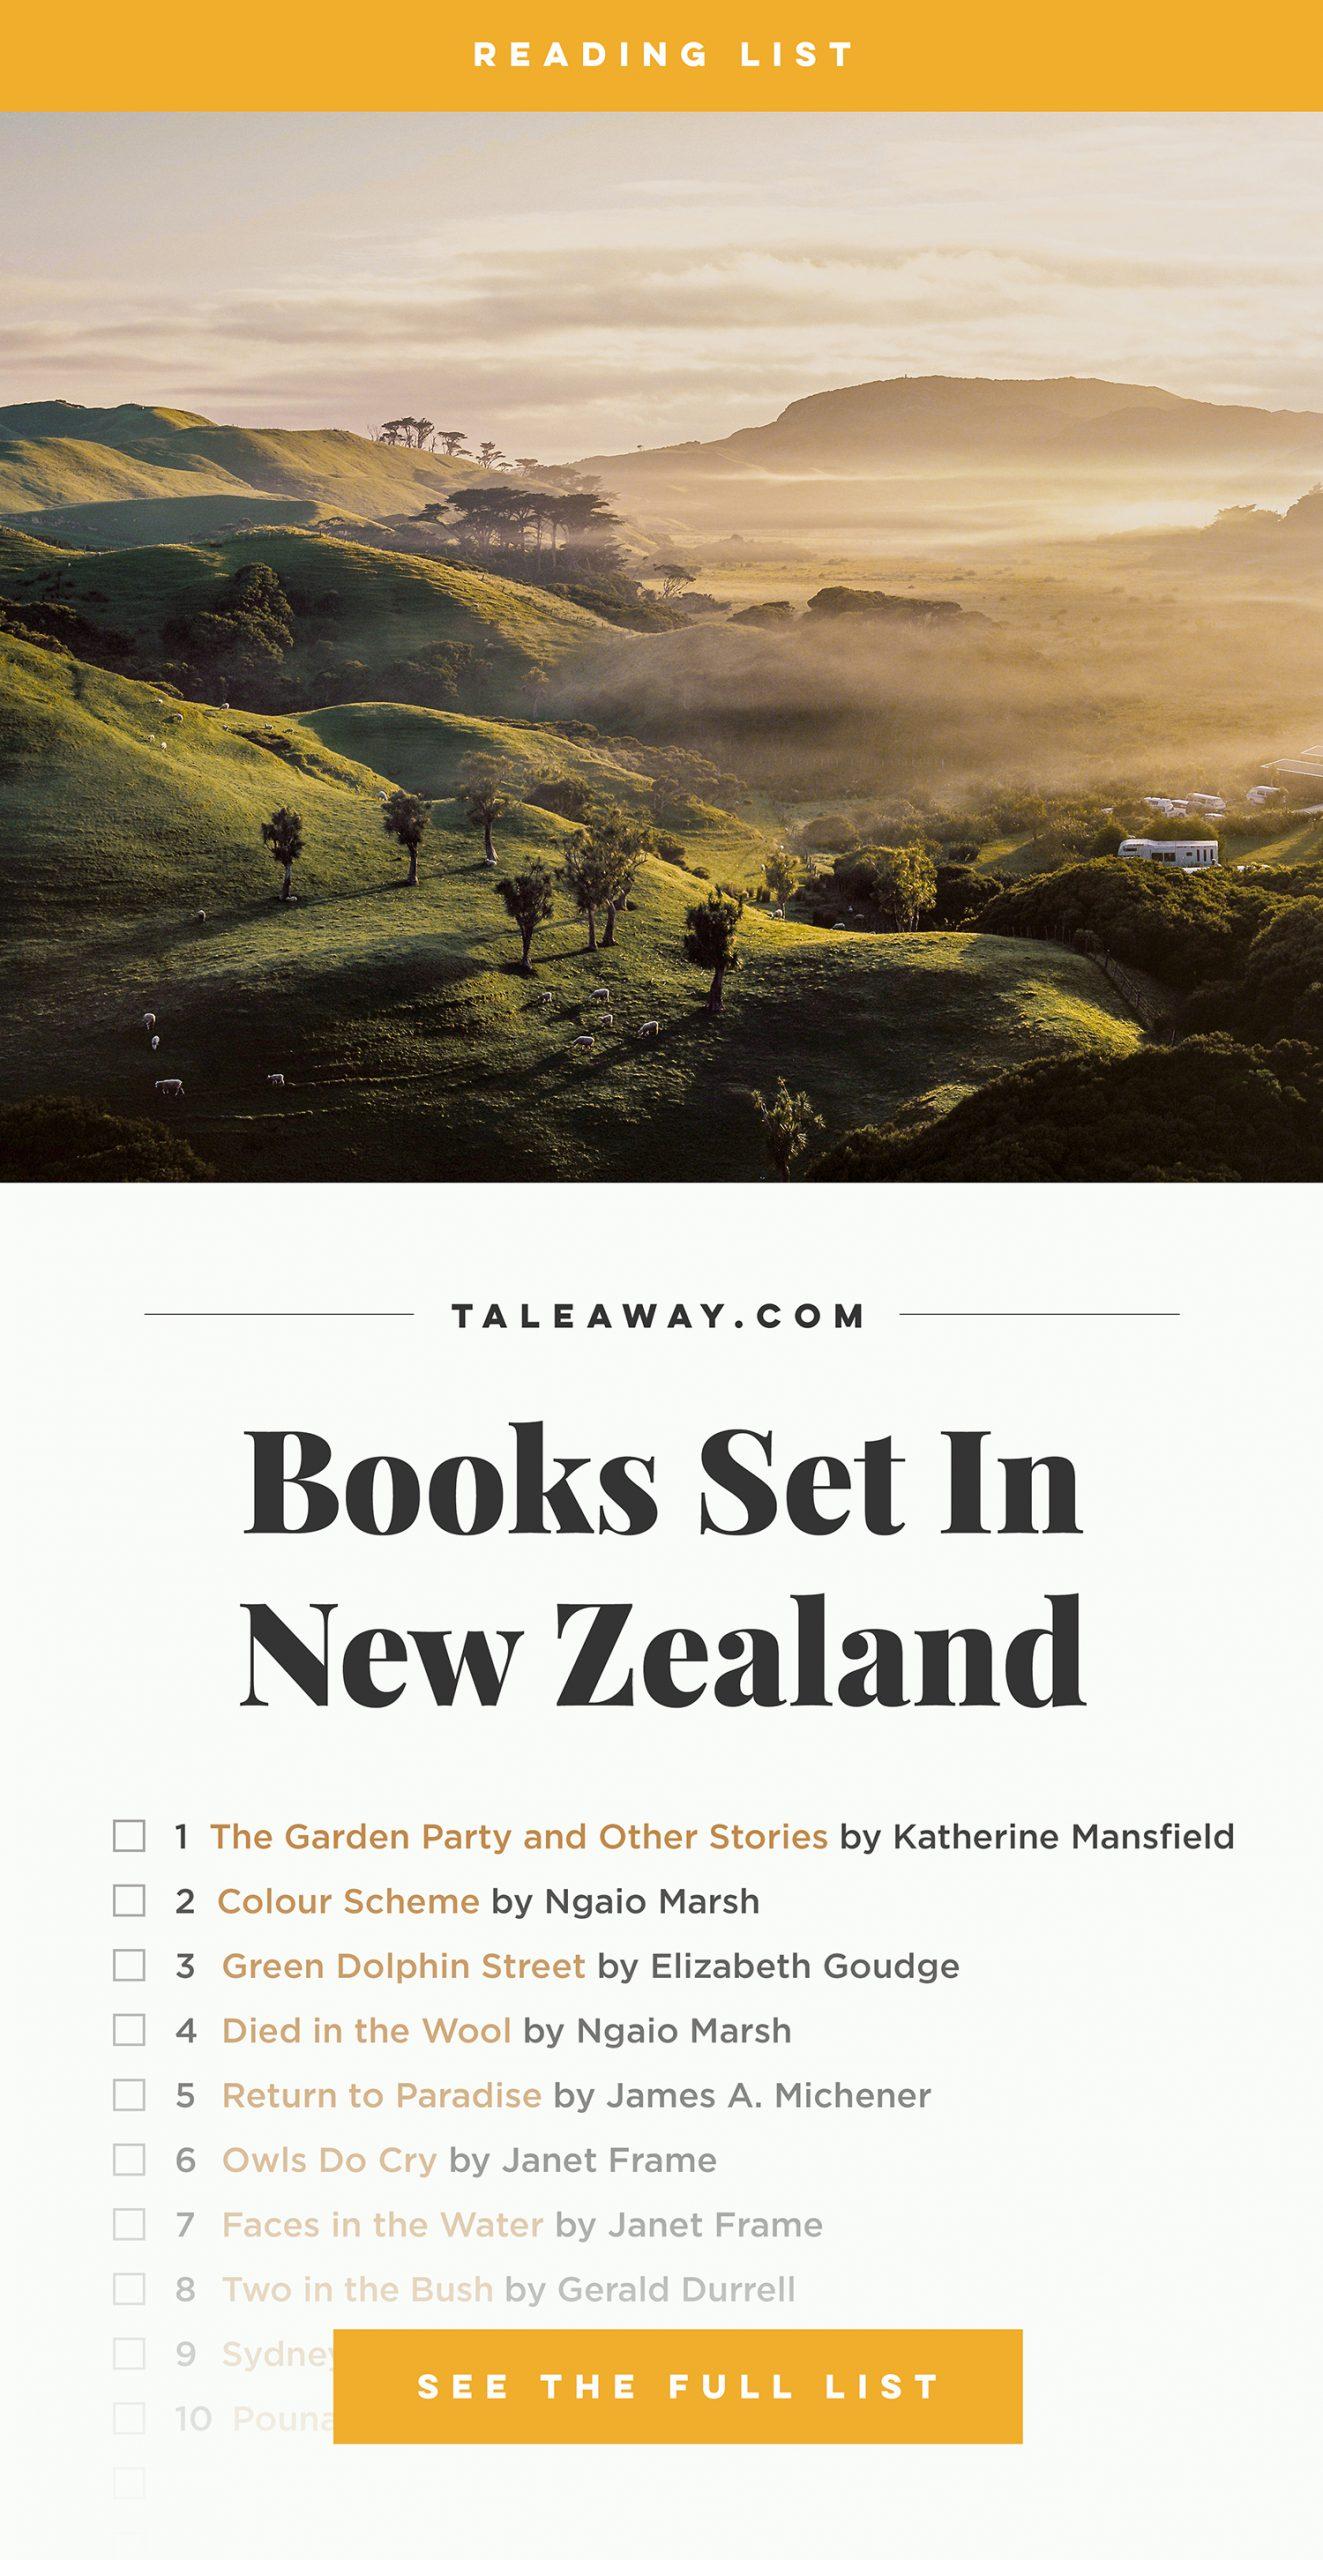 Books Set In New Zealand - new zealand books, new zealand novels, new zealand literature, new zealand fiction, new zealand, new zealand authors, new zealand travel, best books set in new zealand, popular new zealand books, new zealand reads, books about new zealand, new zealand reading challenge, new zealand reading list, new zealand history, new zealand travel books, new zealand books to read, novels set in new zealand, books to read about new zealand, oceania books, book challenge, books and travel, travel reading list, reading list, reading challenge, books to read, books around the world, new zealand culture, auckland books, christchurch books, wellington books, nz books